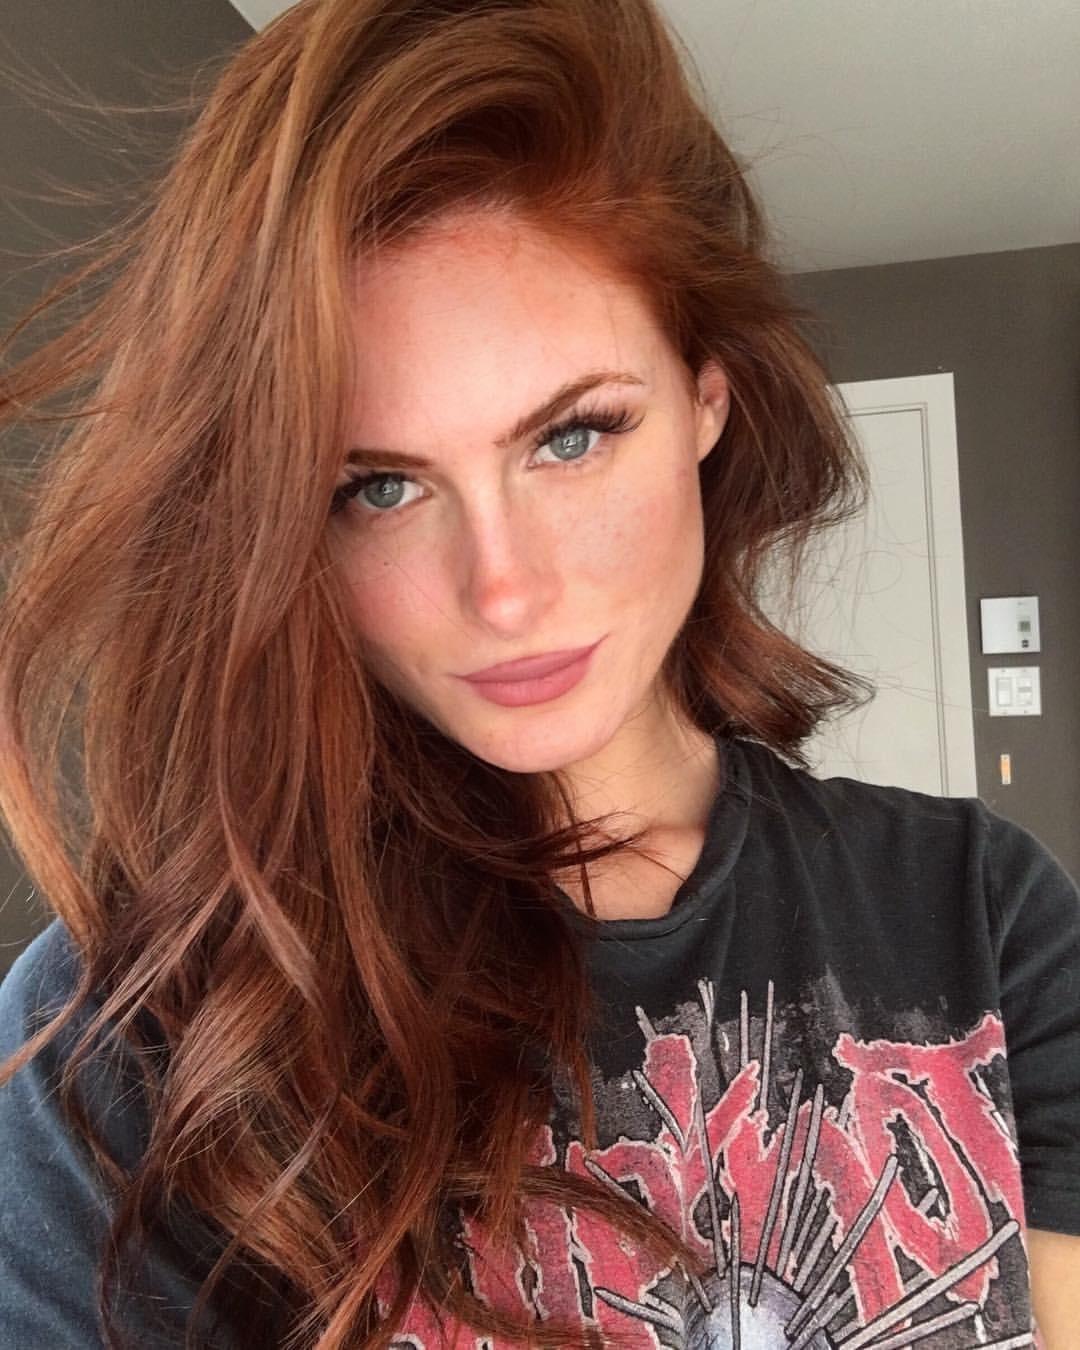 miguelle landry | red hair green eyes, red hair model, hair